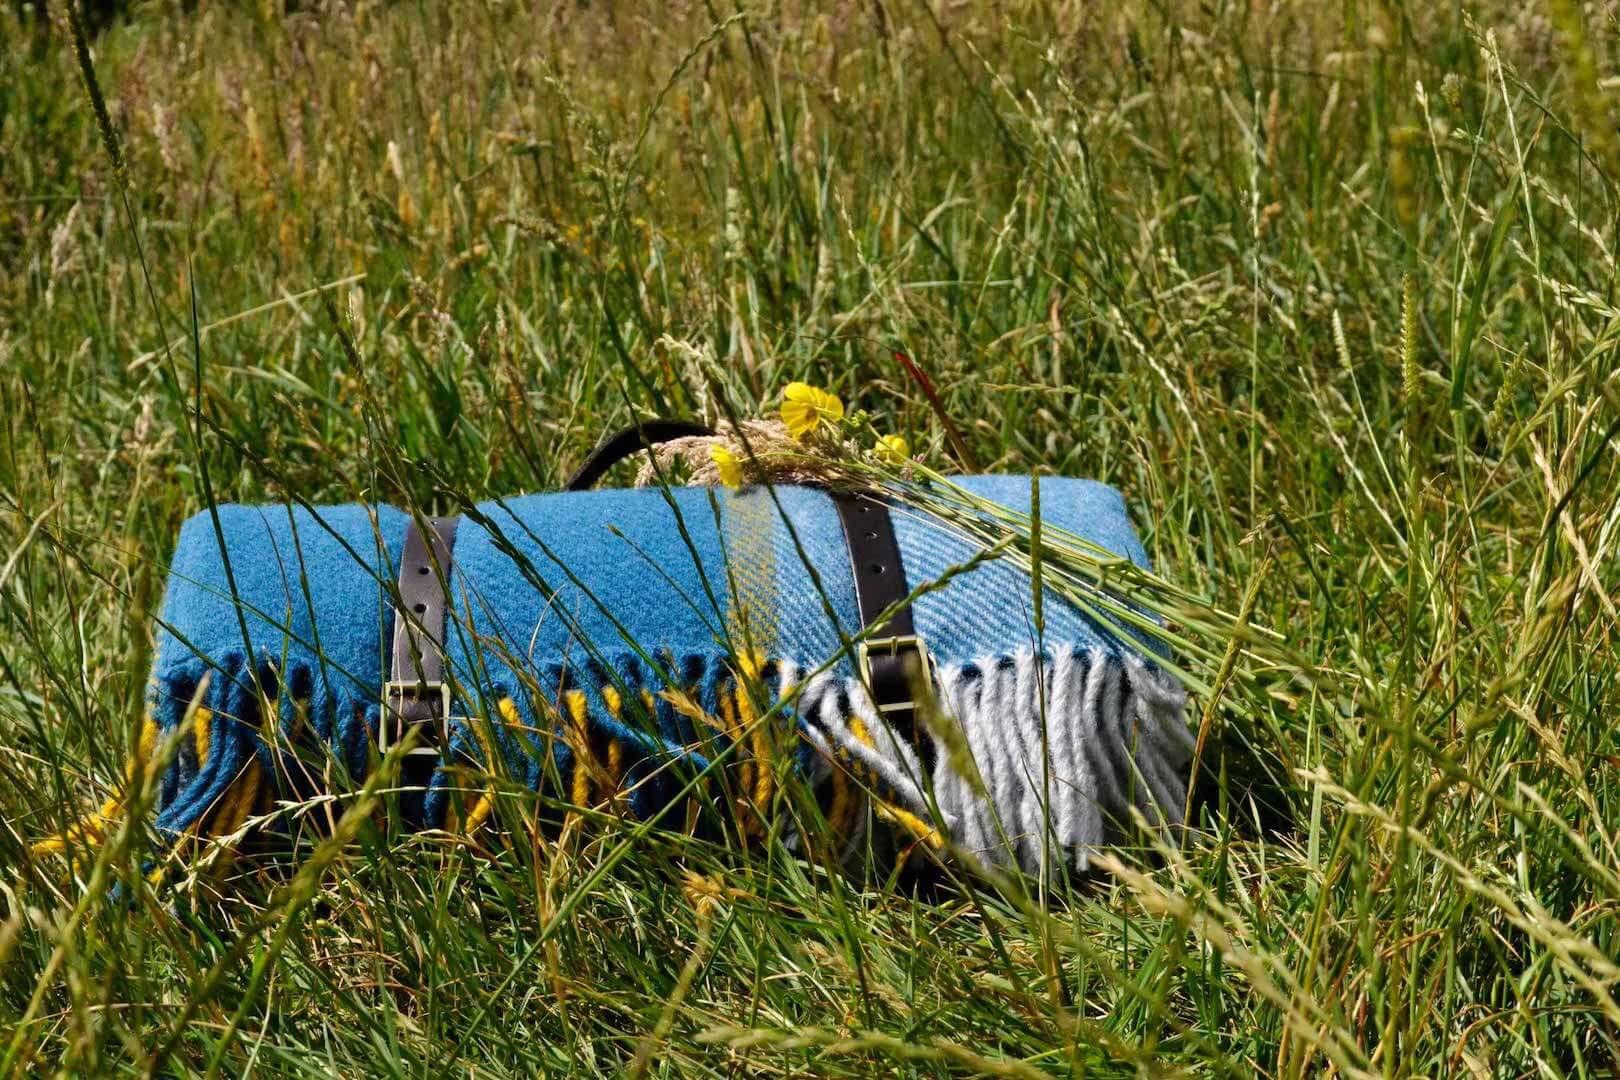 blue-yellow-picnic-rug